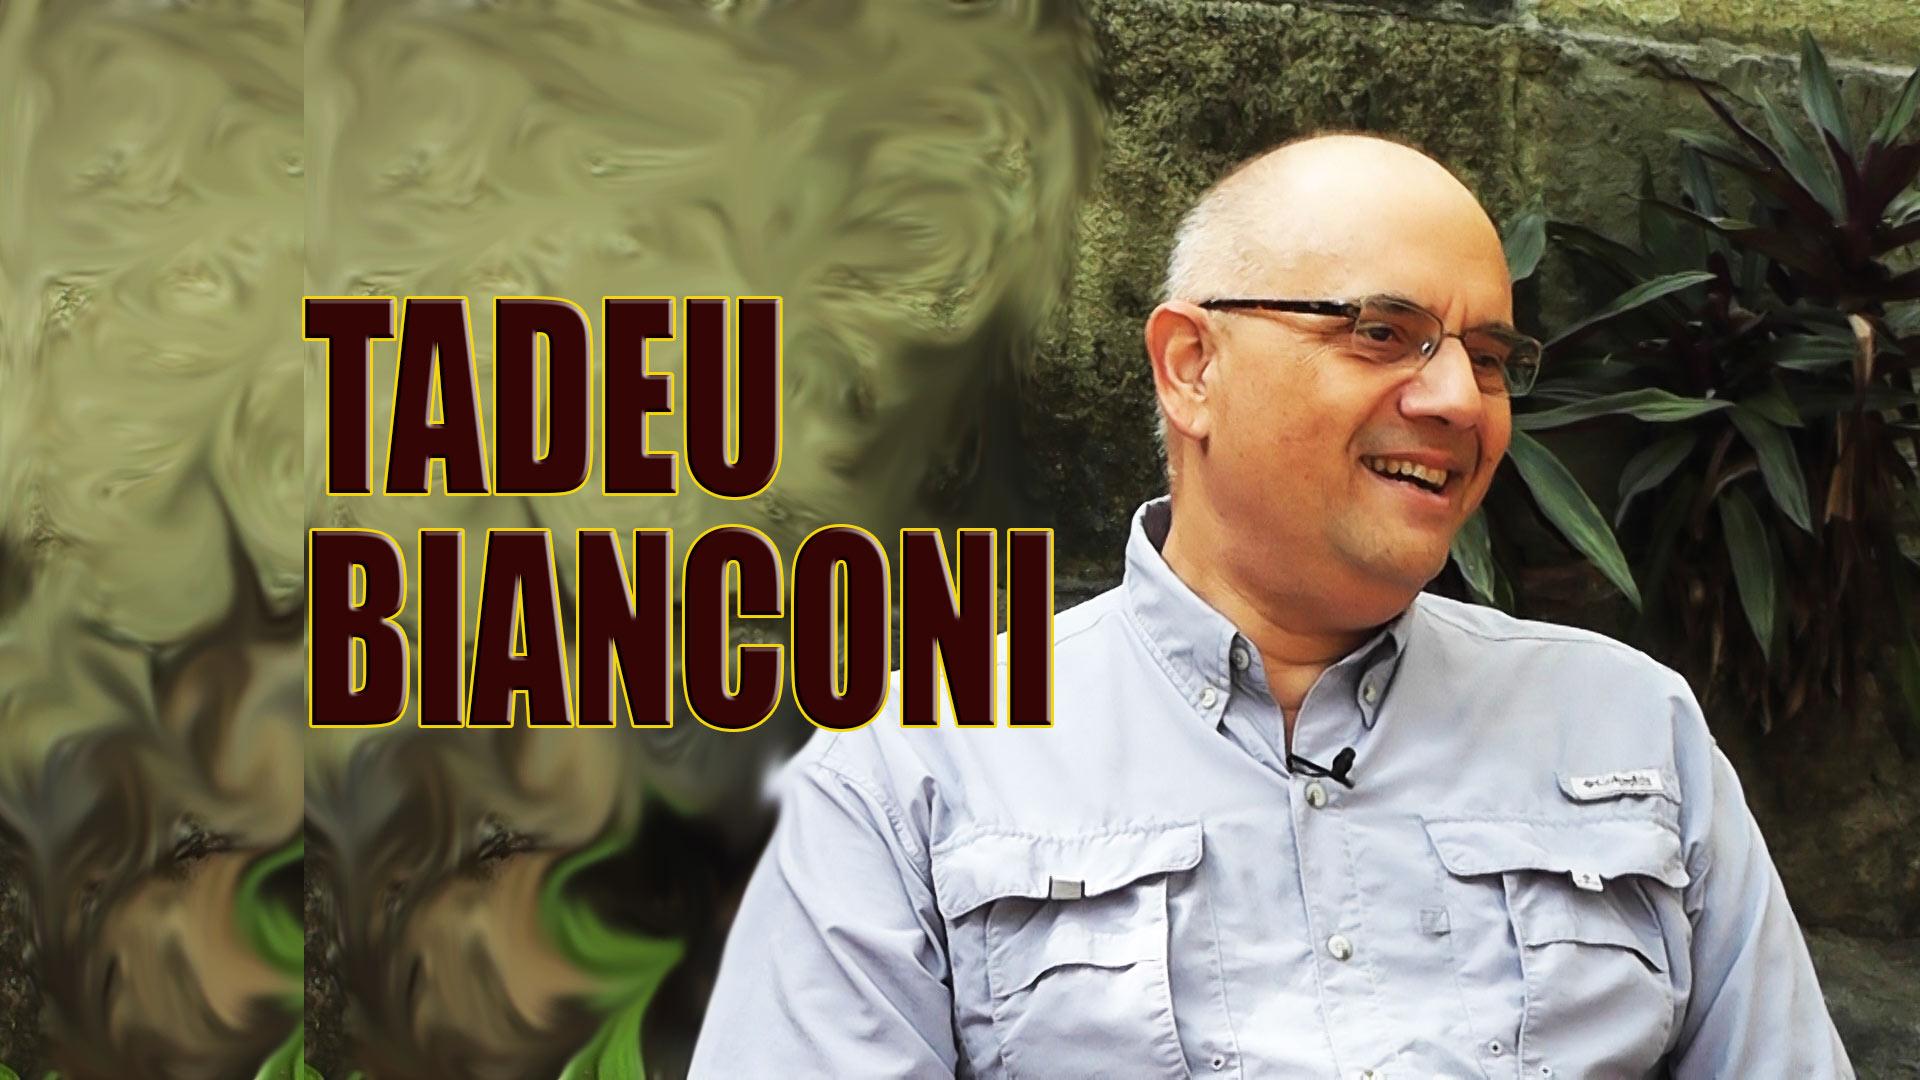 Tadeu Bianconi em Fotógrafos